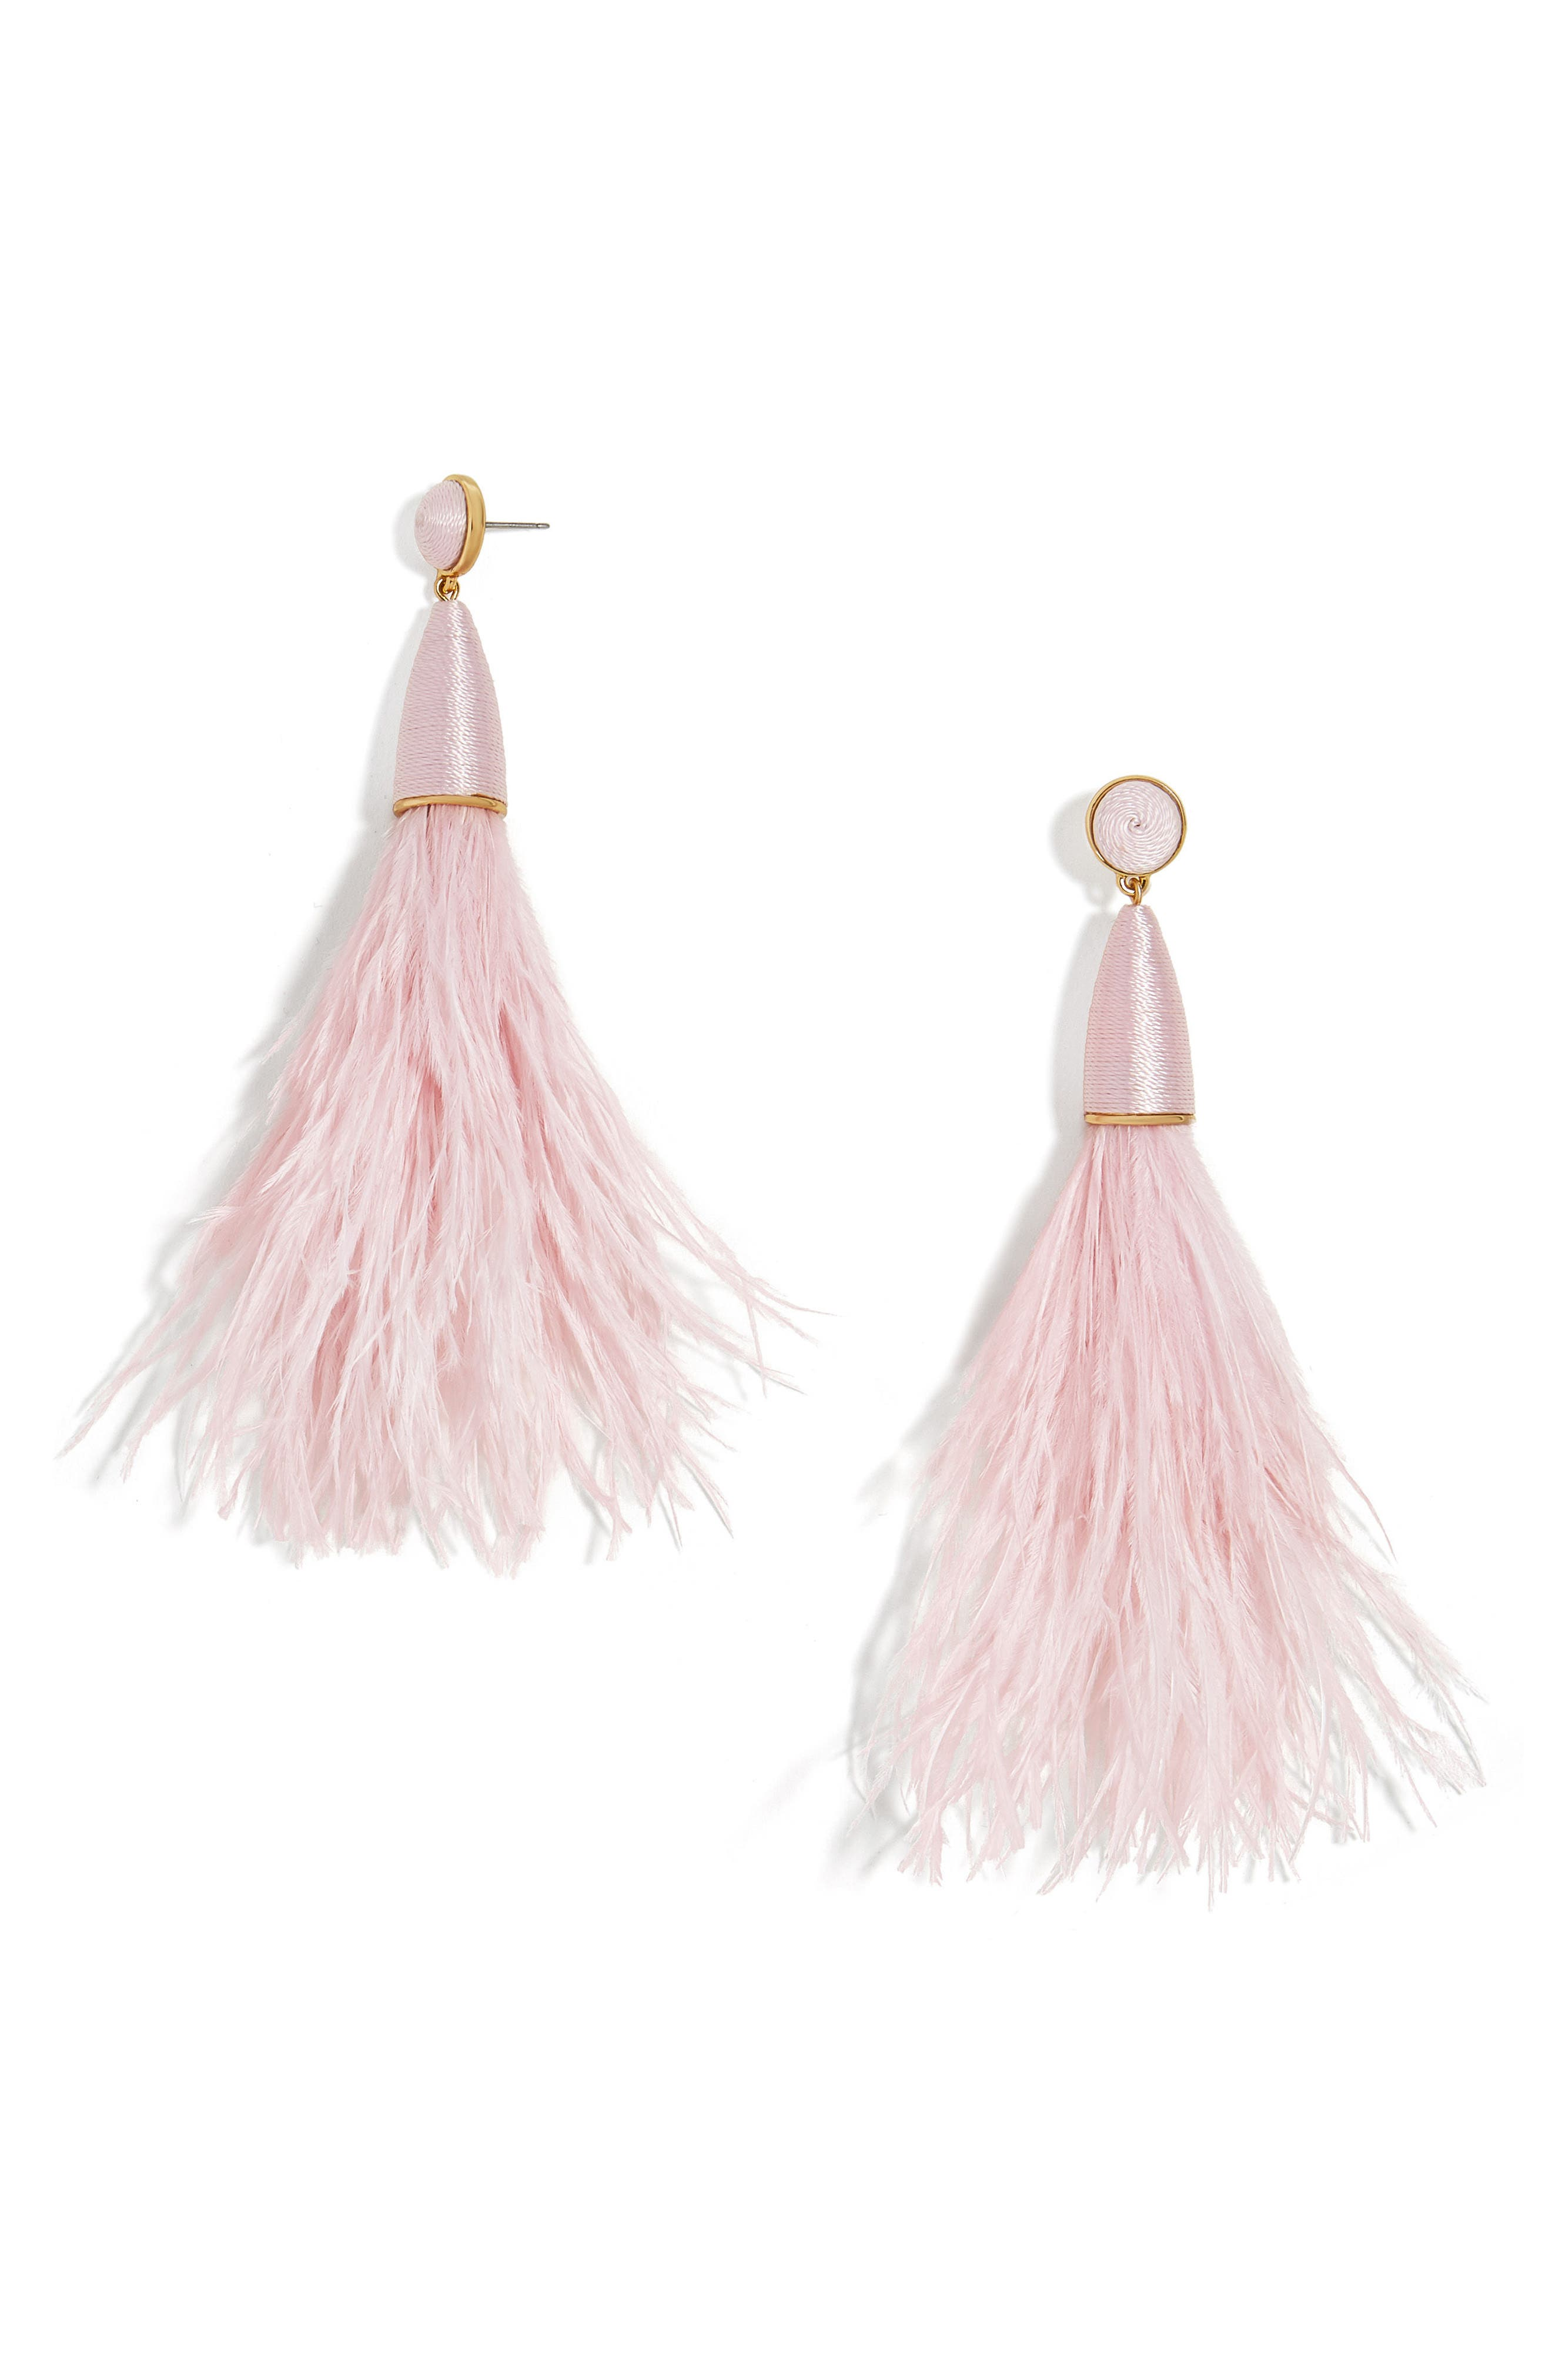 Chateau Feather Tassel Earrings,                         Main,                         color, Blush